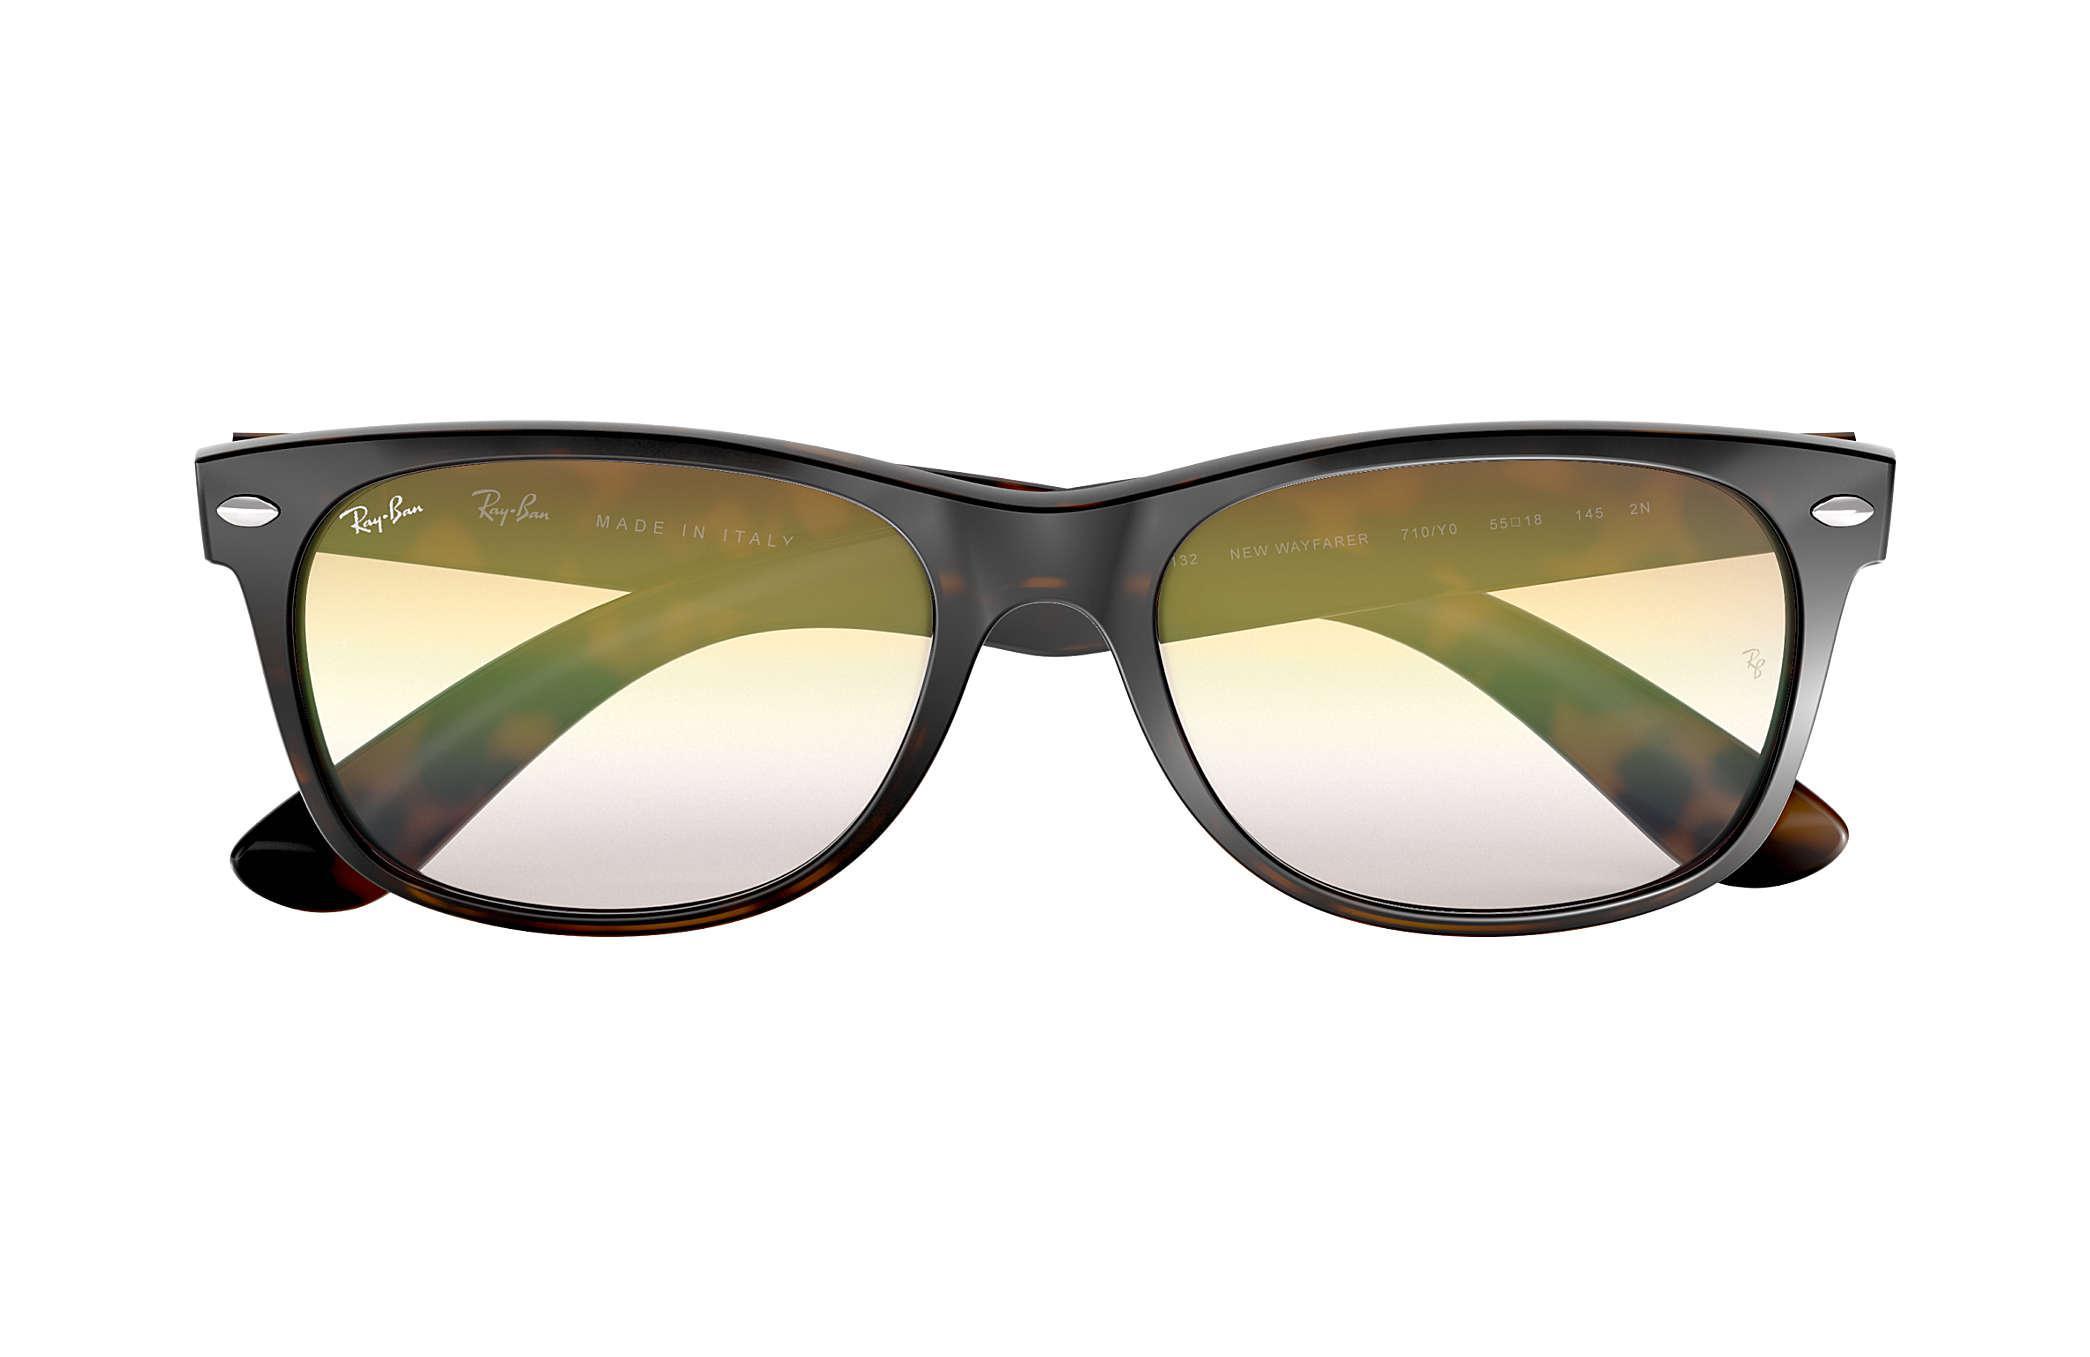 4c9e790f77 Lyst - Ray-Ban New Wayfarer Flash Gradient Lenses in Metallic for Men